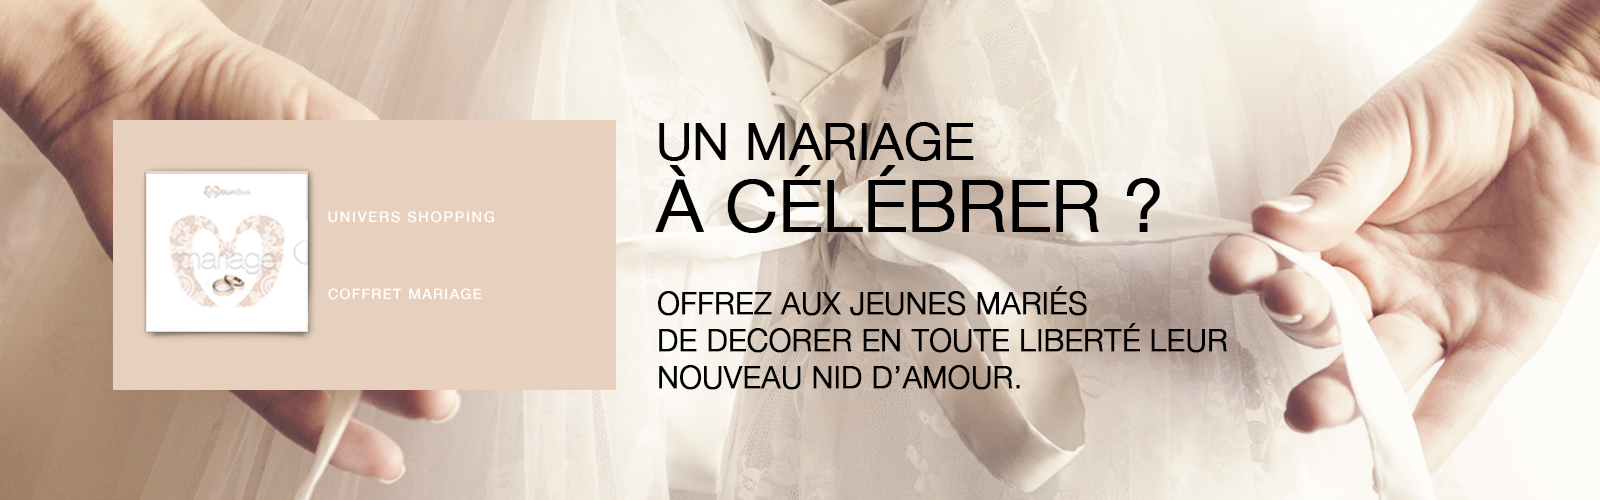 bandeau-mariage